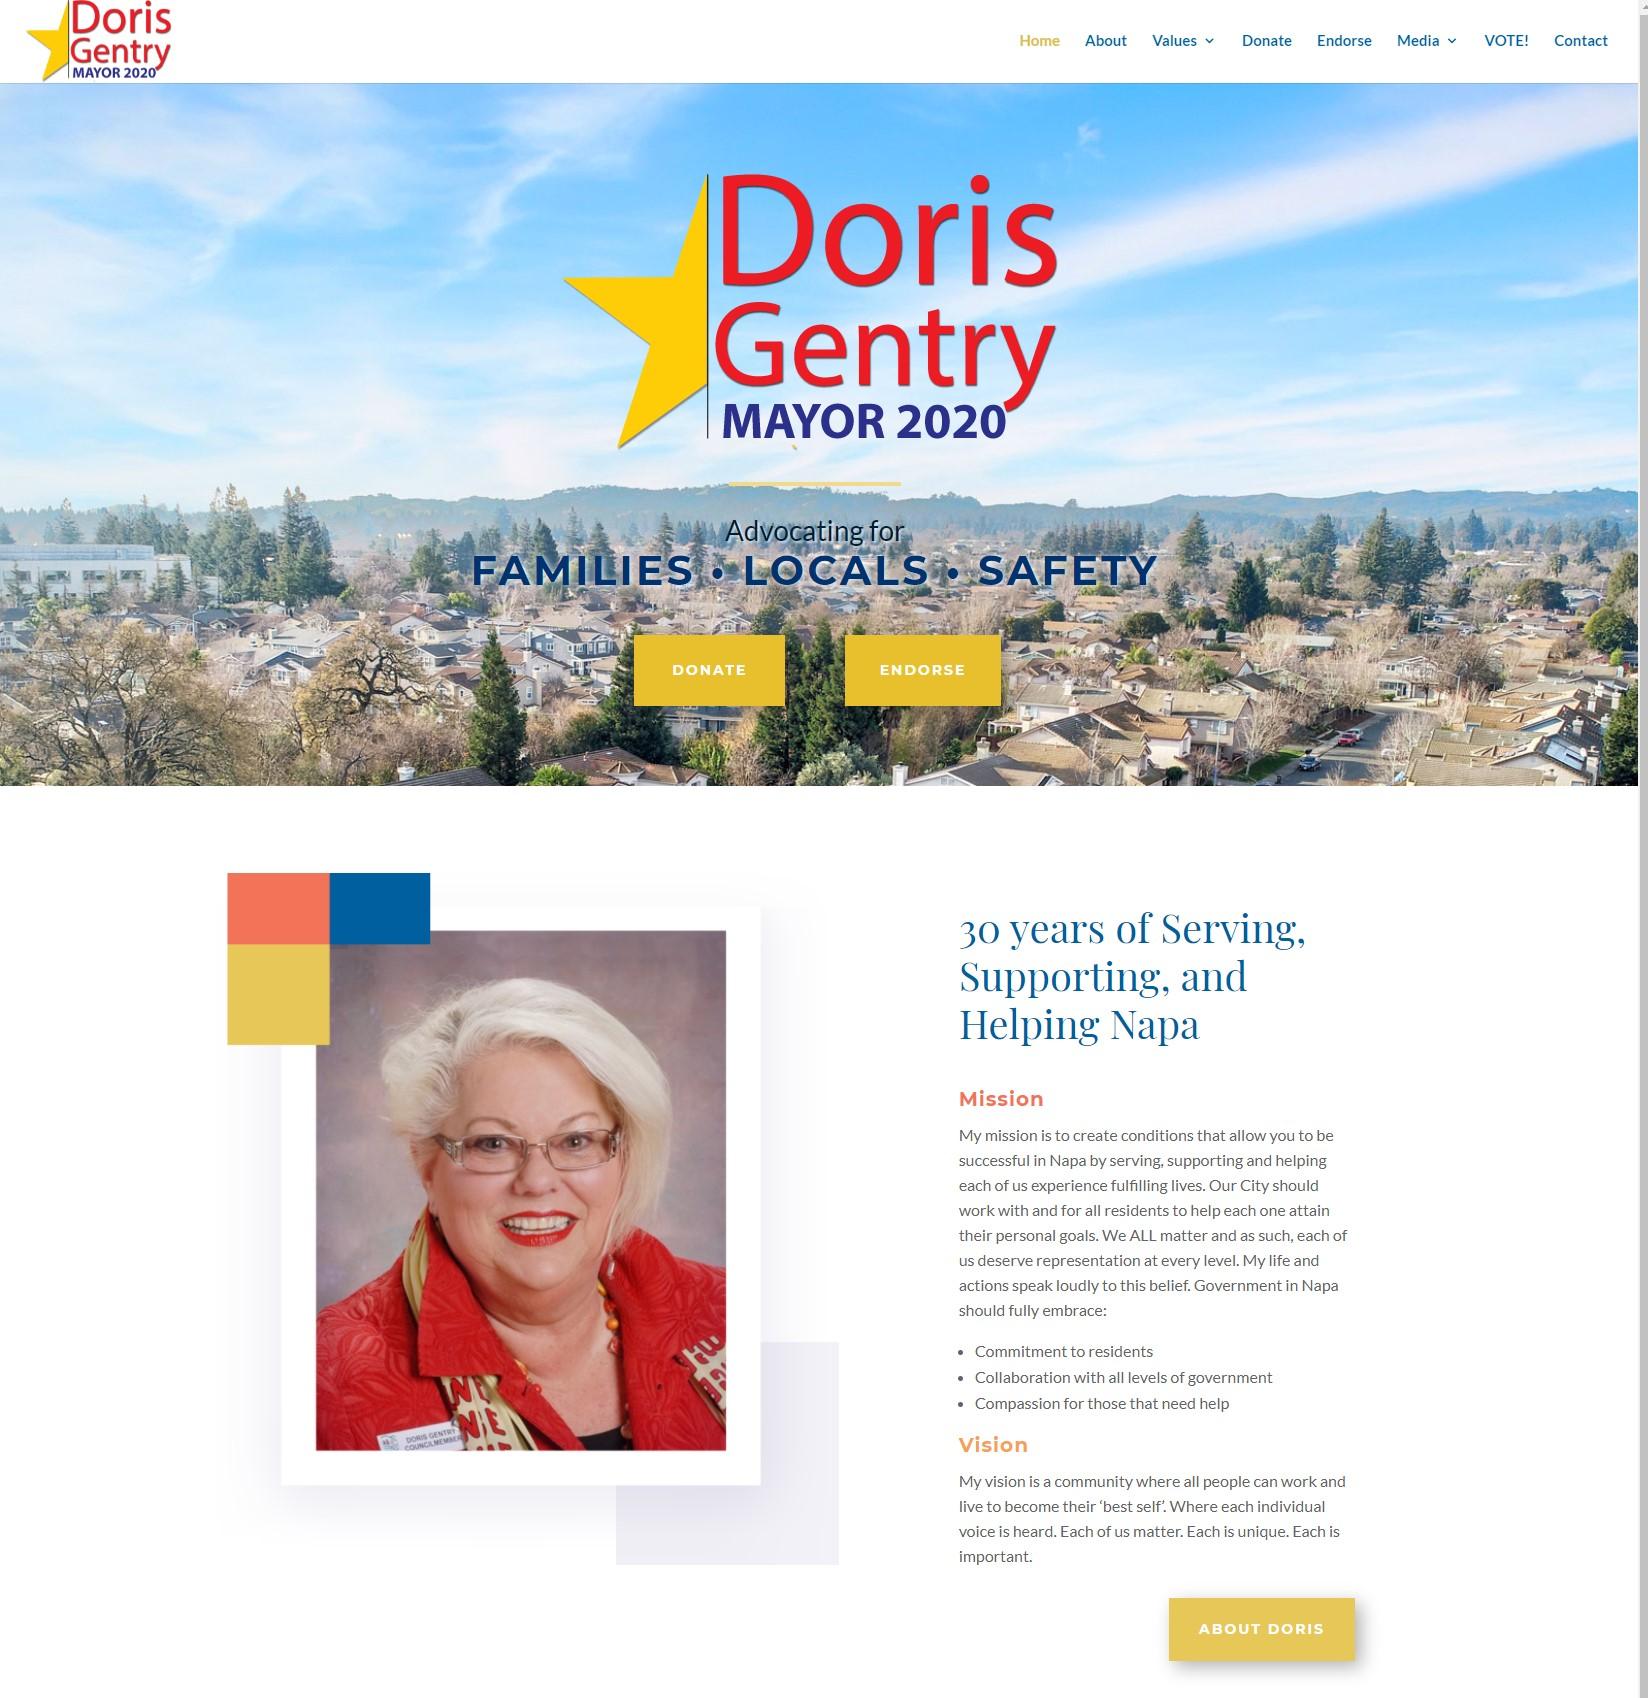 Doris Gentry image